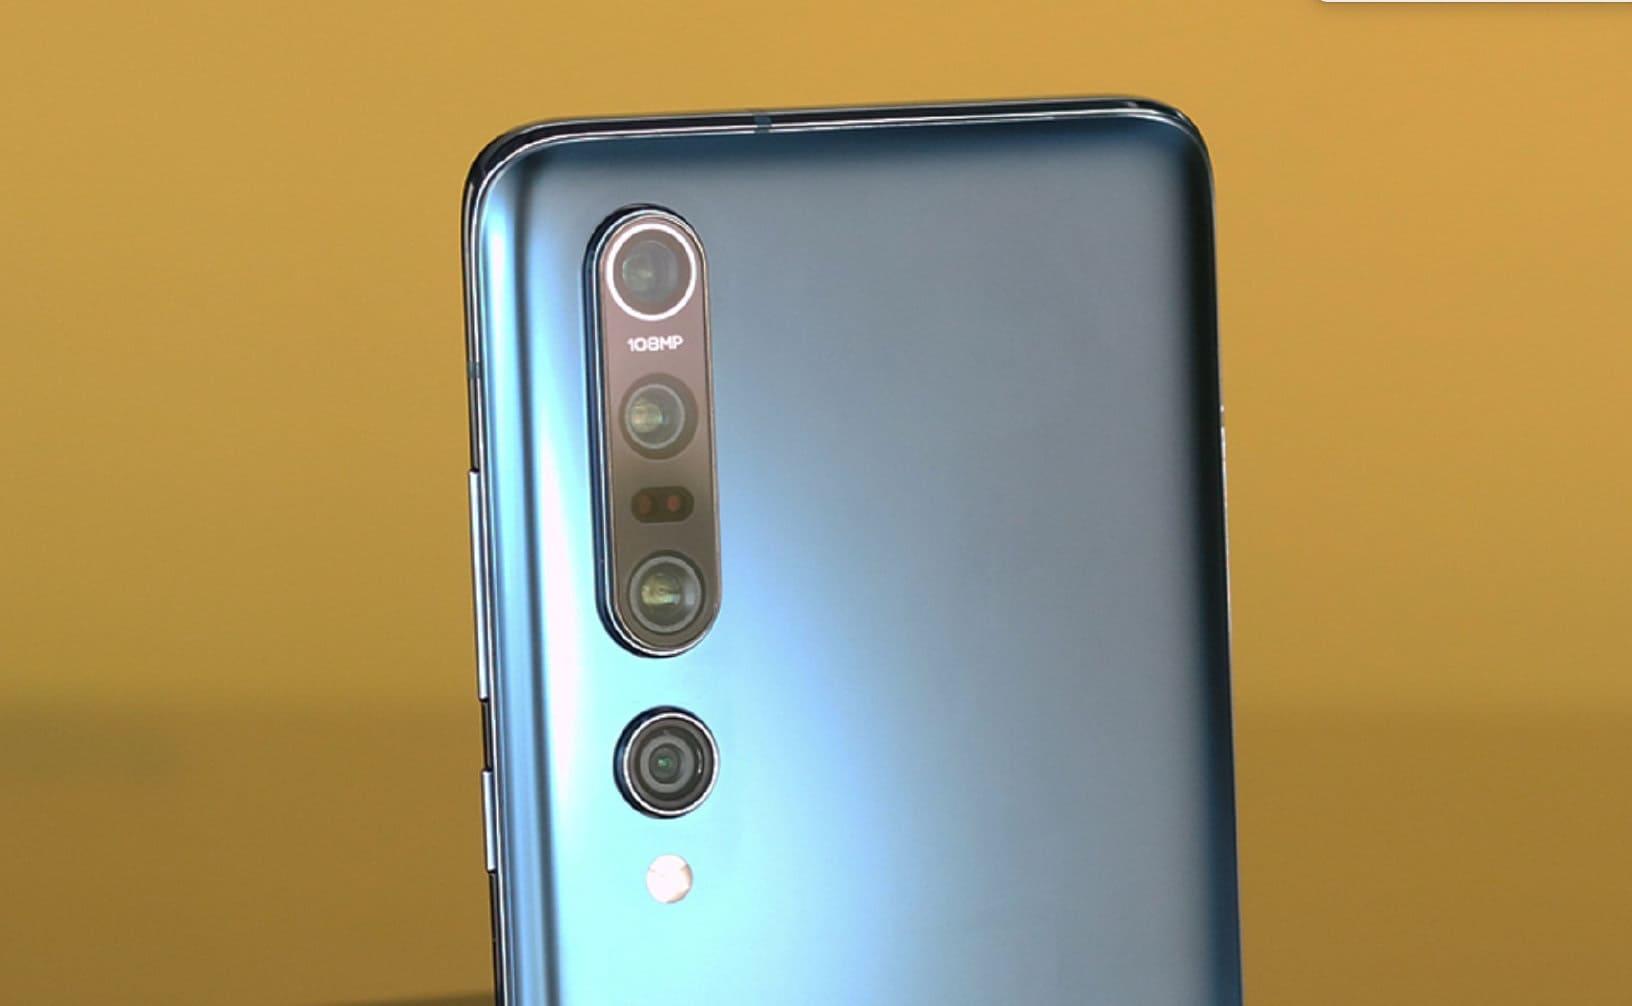 Камера смартфона 108 МП